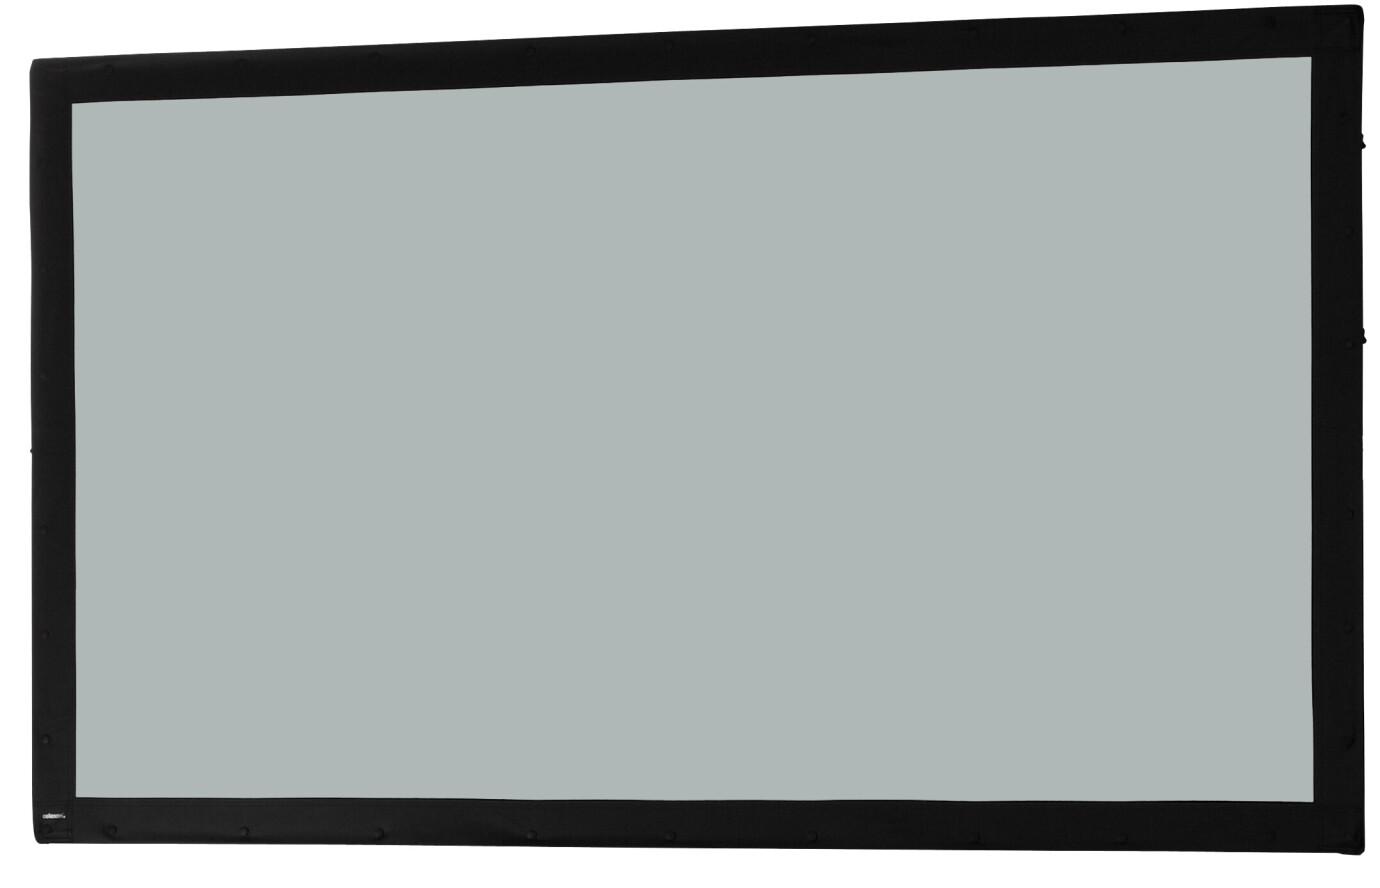 celexon Tuch für Faltrahmen Mobil Expert - 305 x 172 cm Rückprojektion